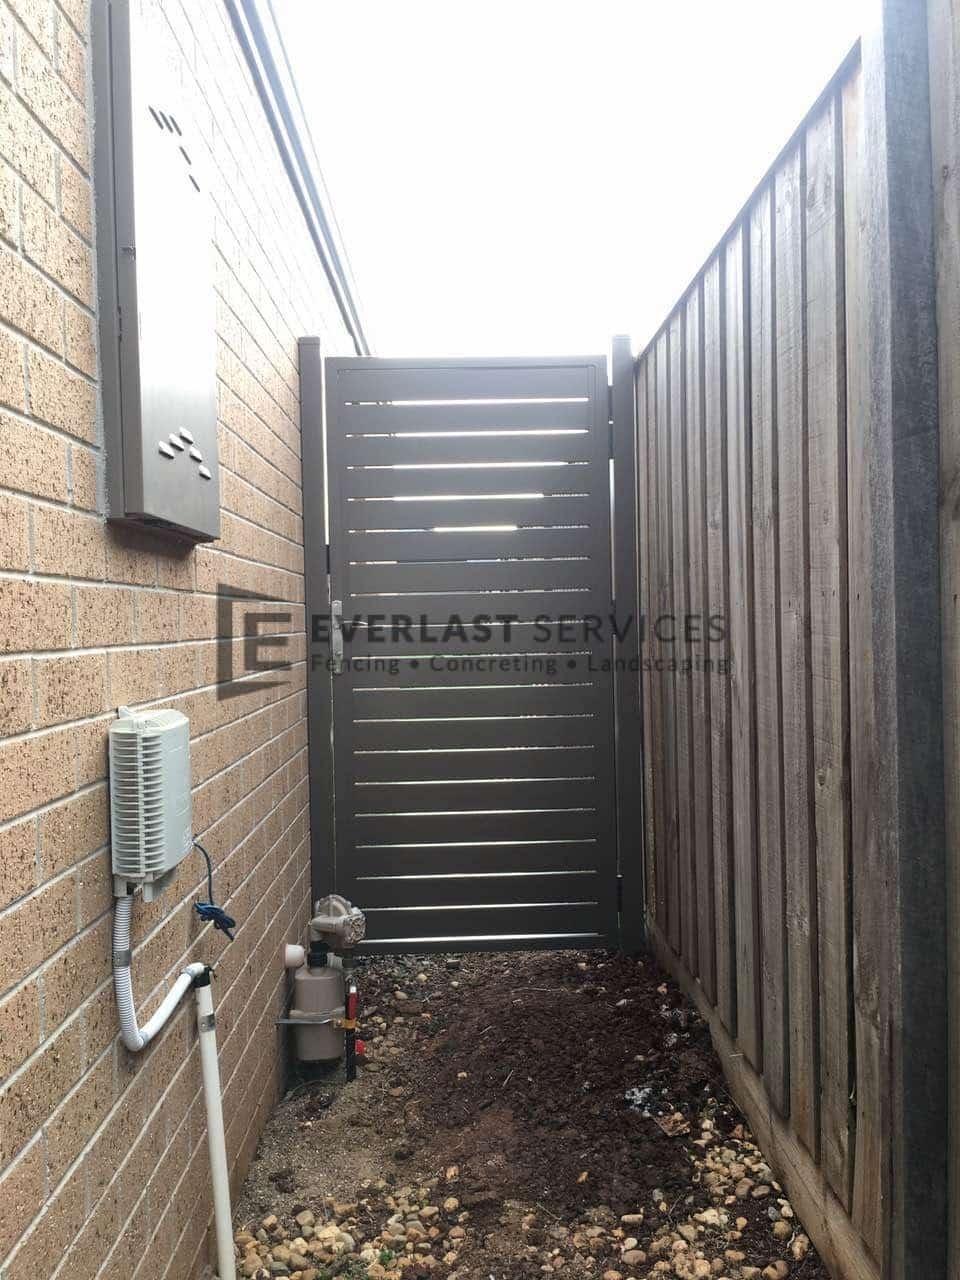 SS107 - Side Access Slat Single Gate